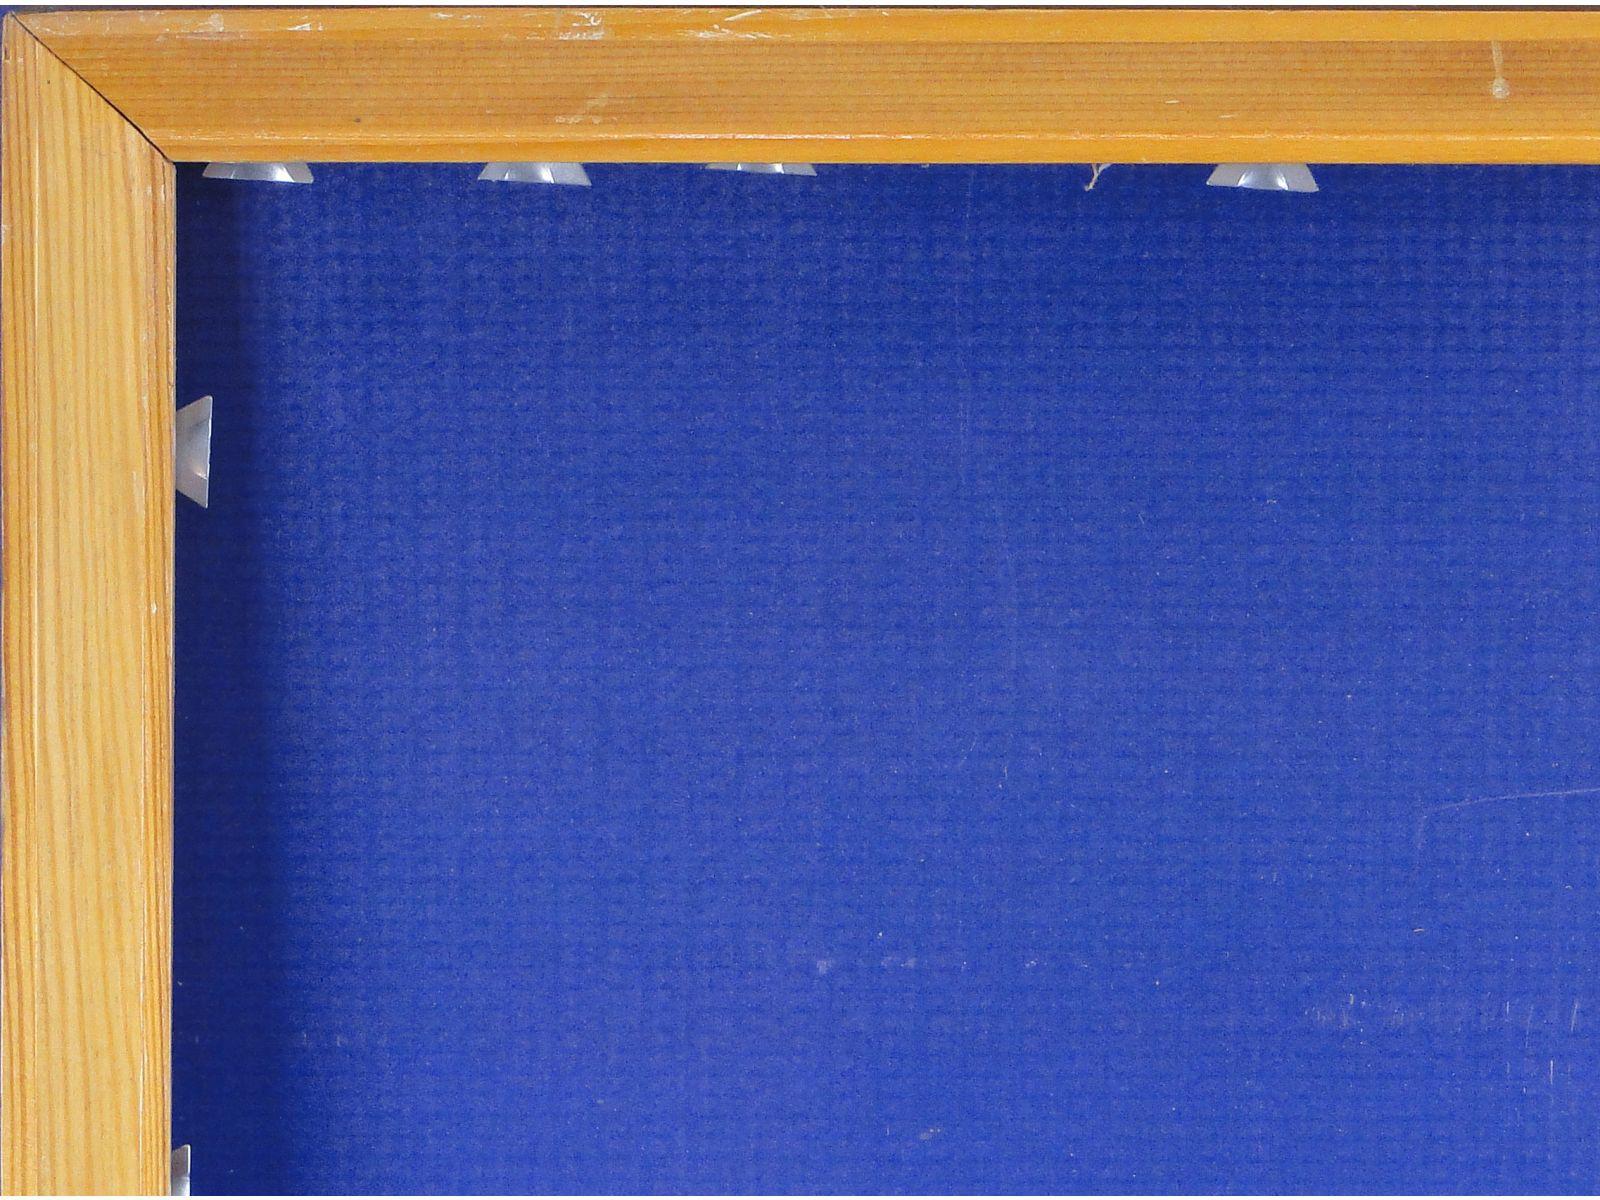 DSC05124.JPG (1600×1200)